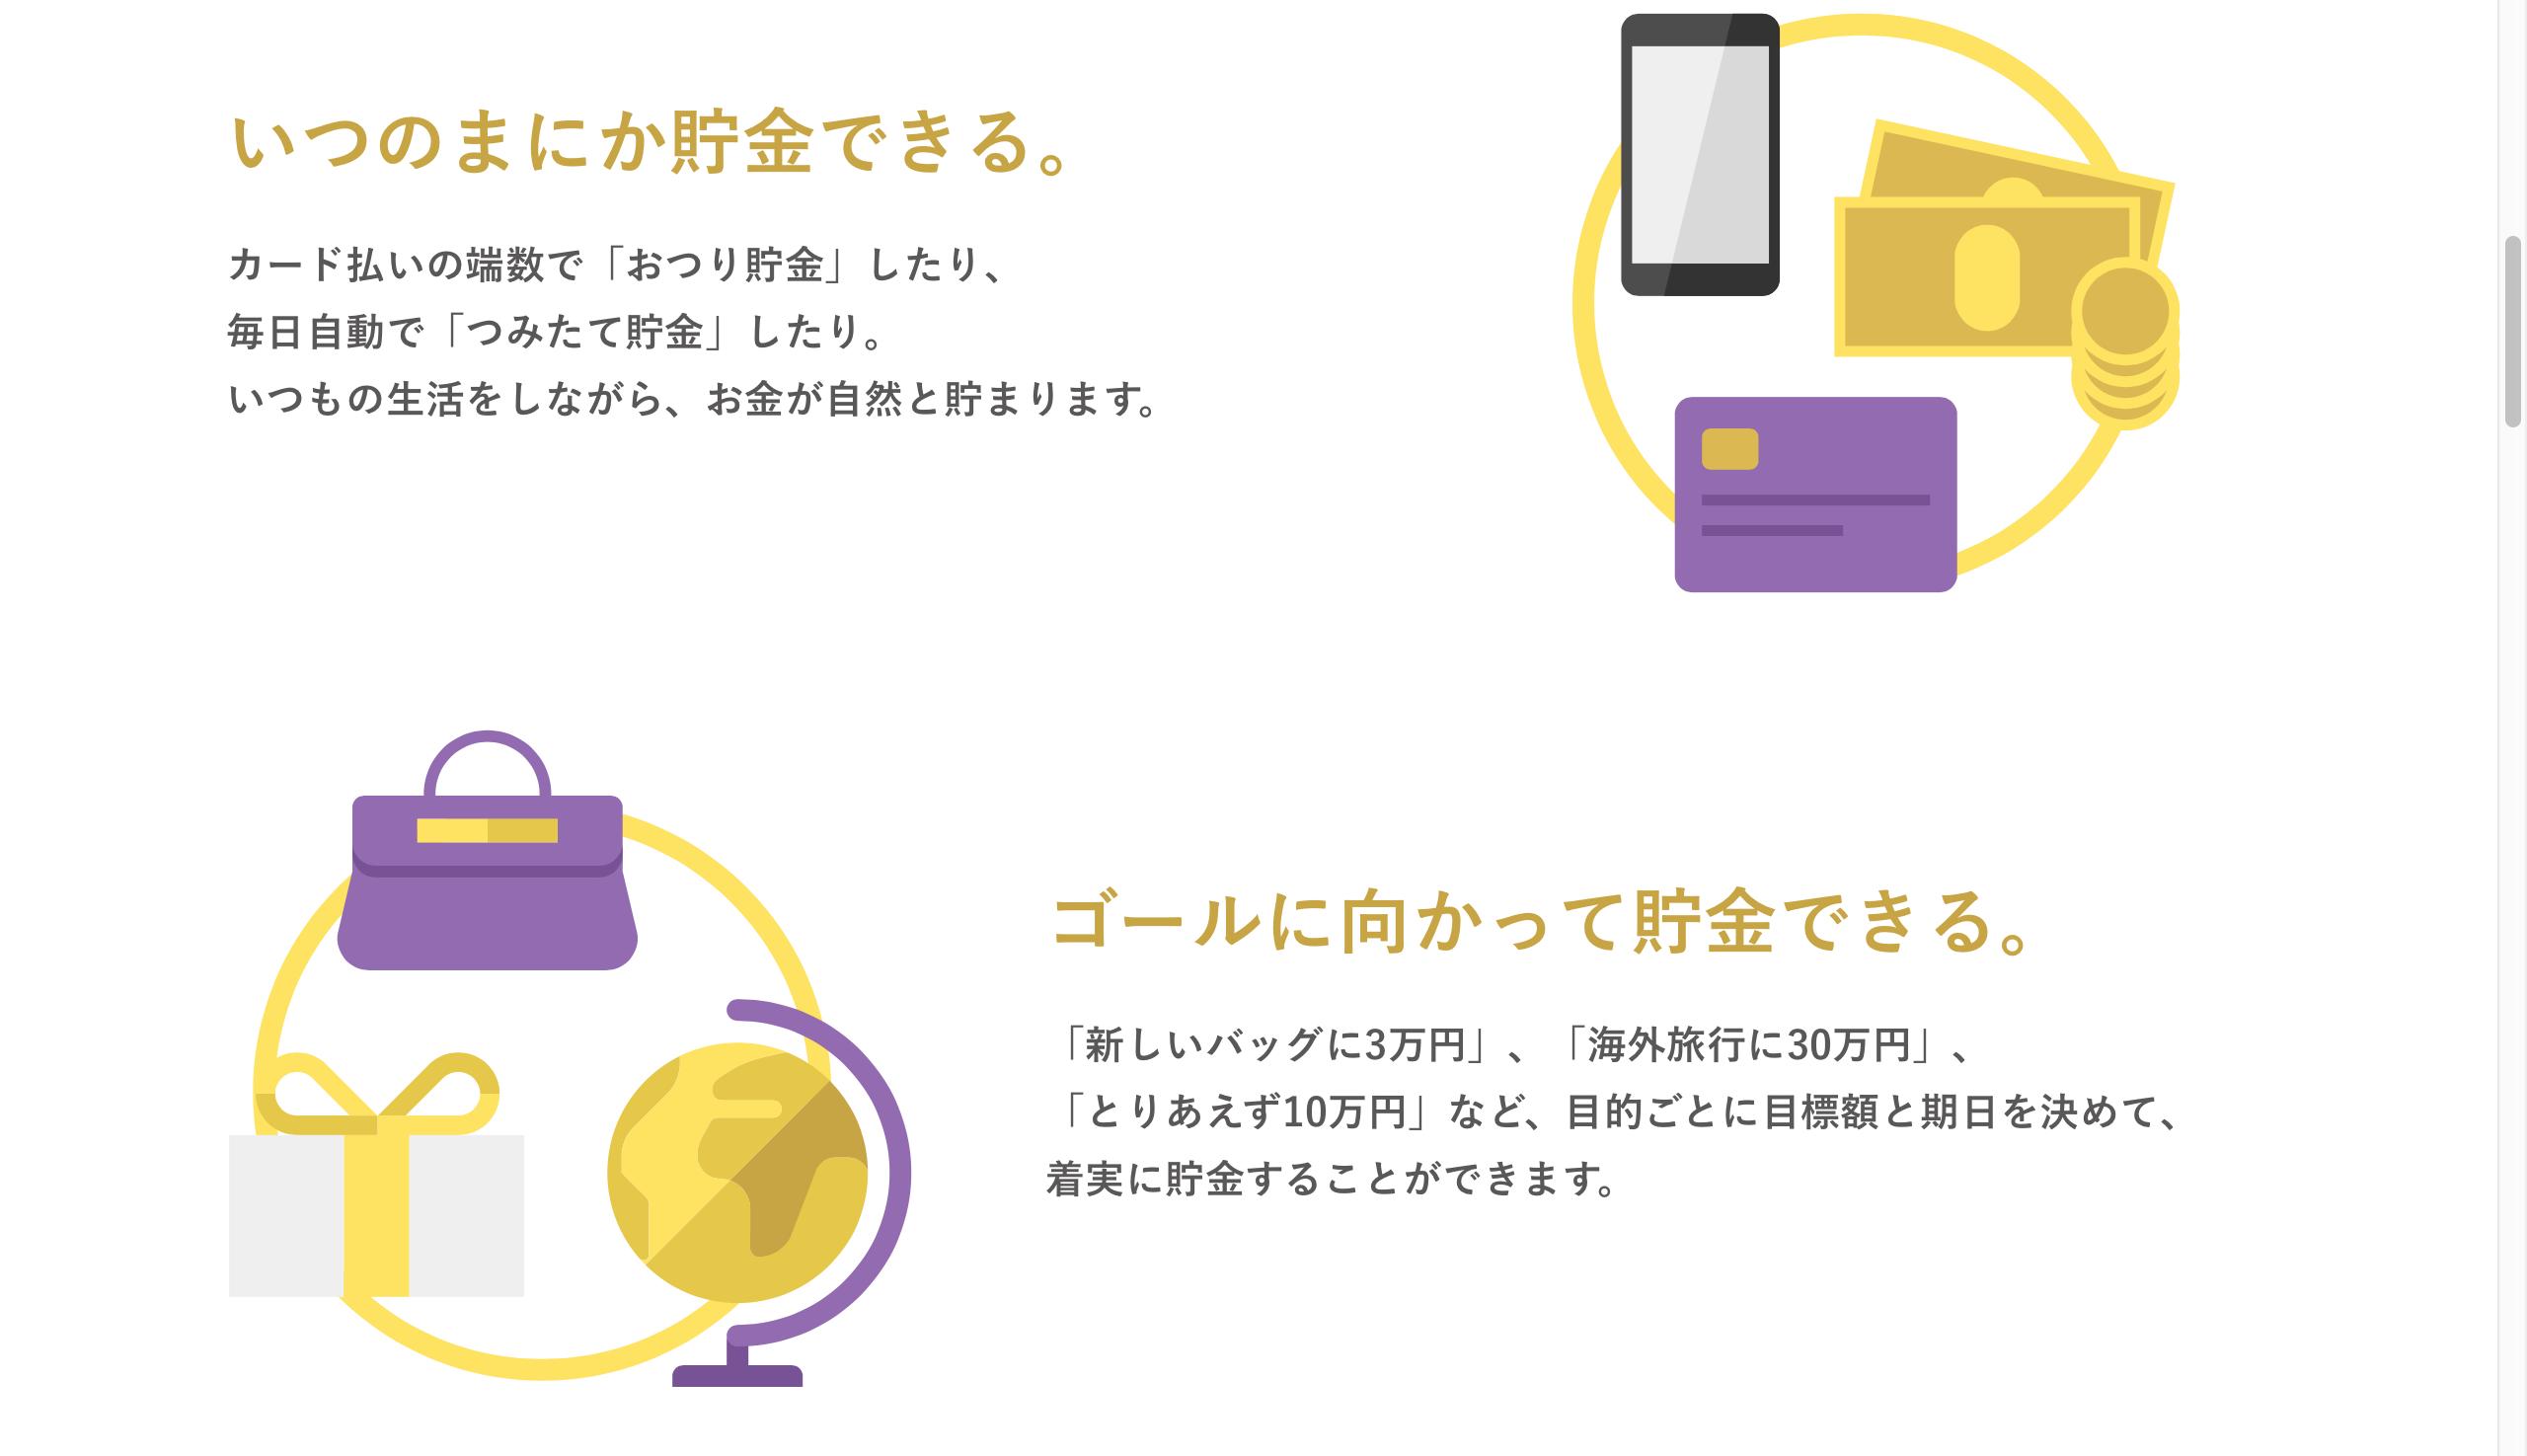 image.space.rakuten.co.jp/d/strg/ctrl/14/c29d6212ca5f583fc1019460771084bbaded4d1b.43.2.14.2.png